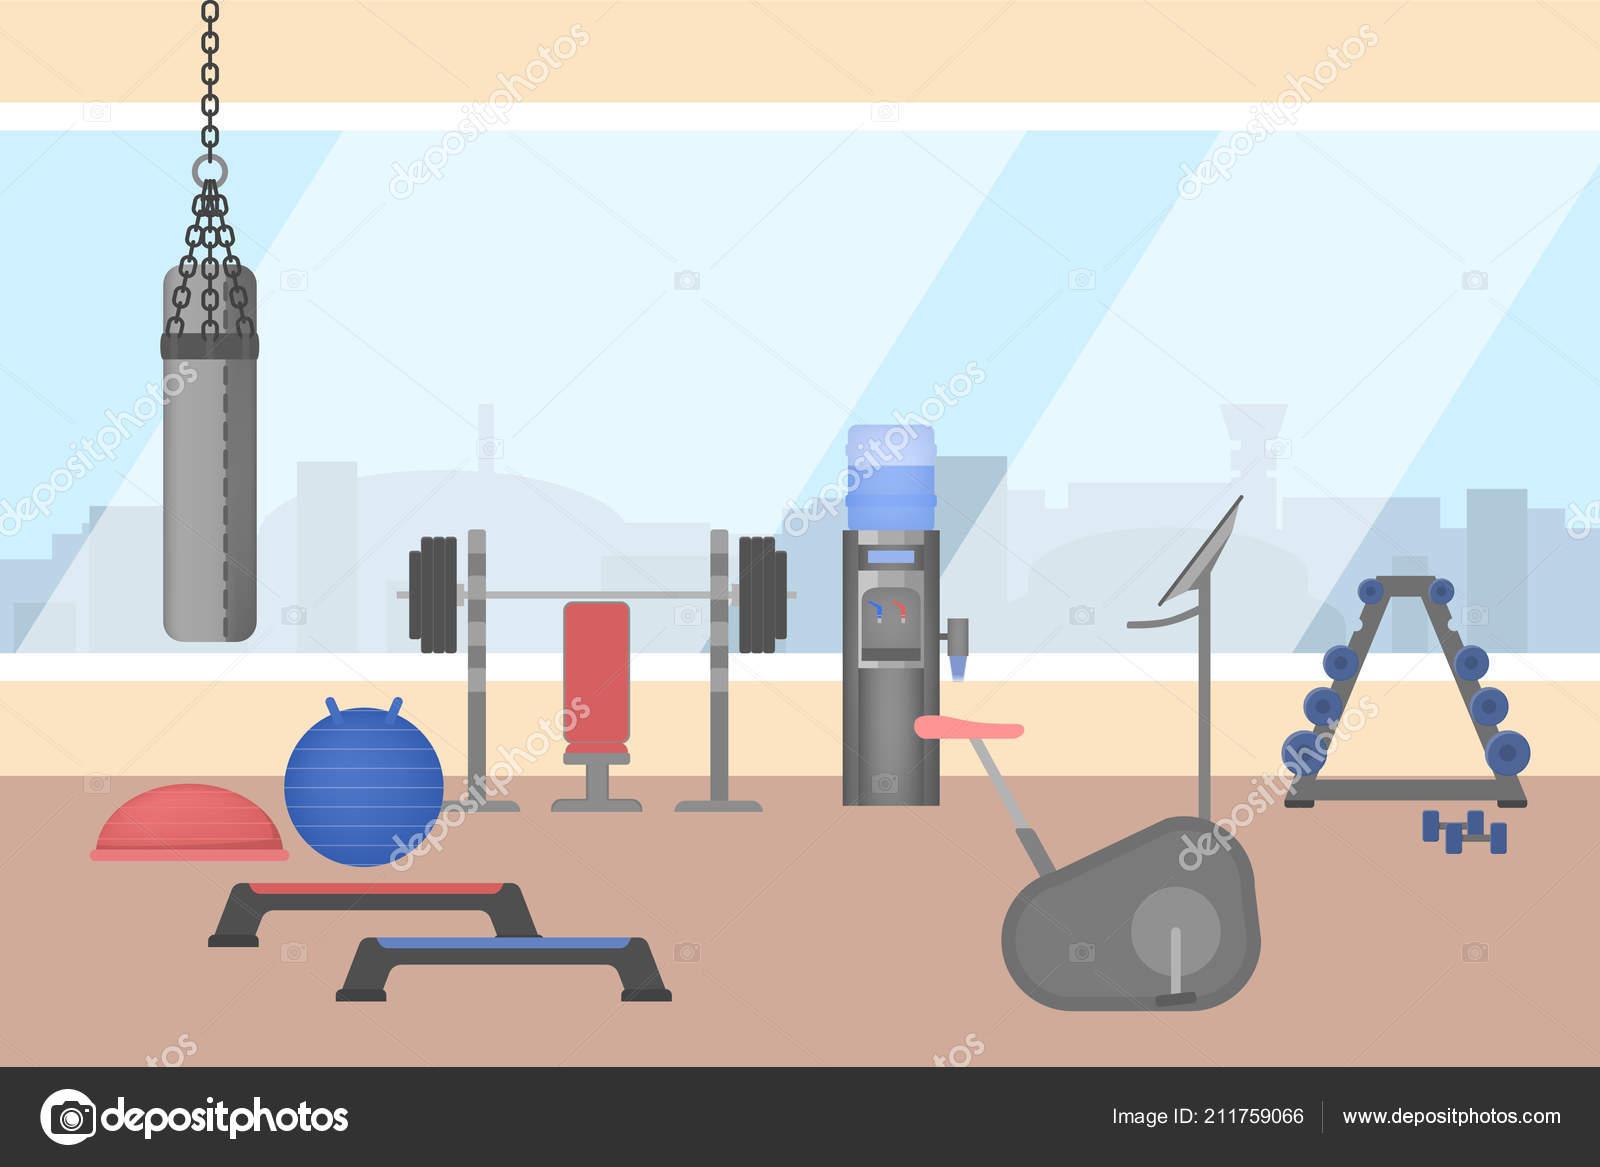 Gym room interior with sport equipment inside u stock vector